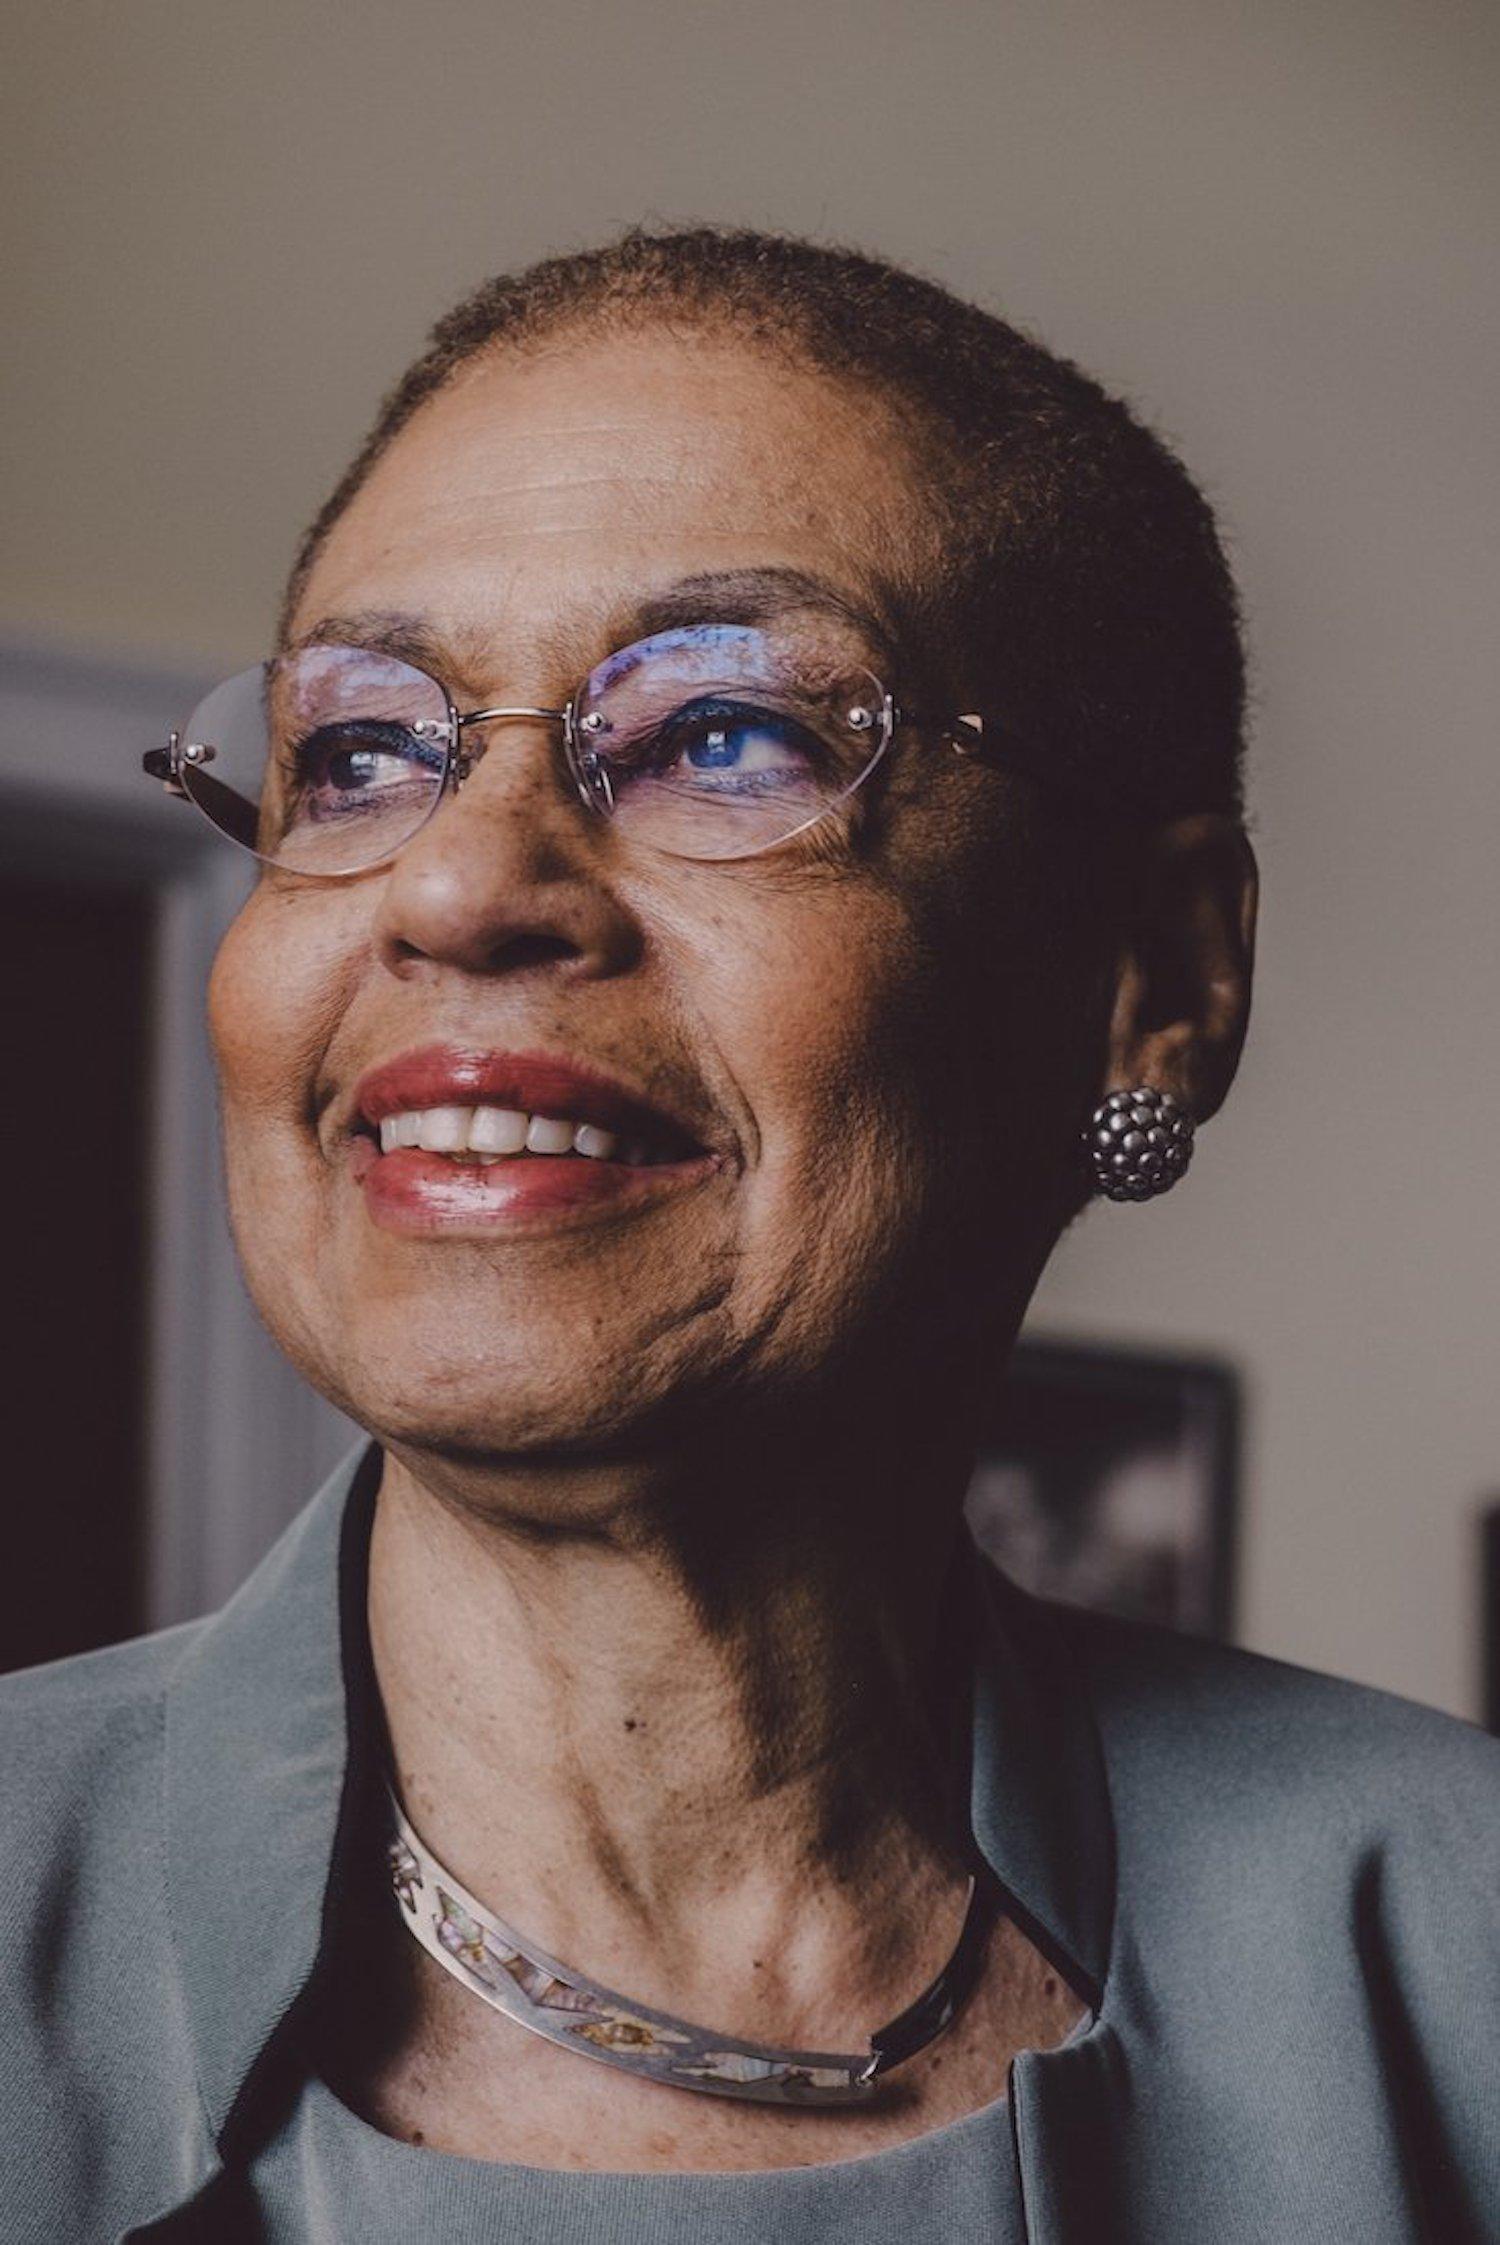 Eleanor Holmes Norton, Willoughby Avenue, The Five Fifths, KOLUMN Magazine, KOLUMN, African American Politics, Black in Politics